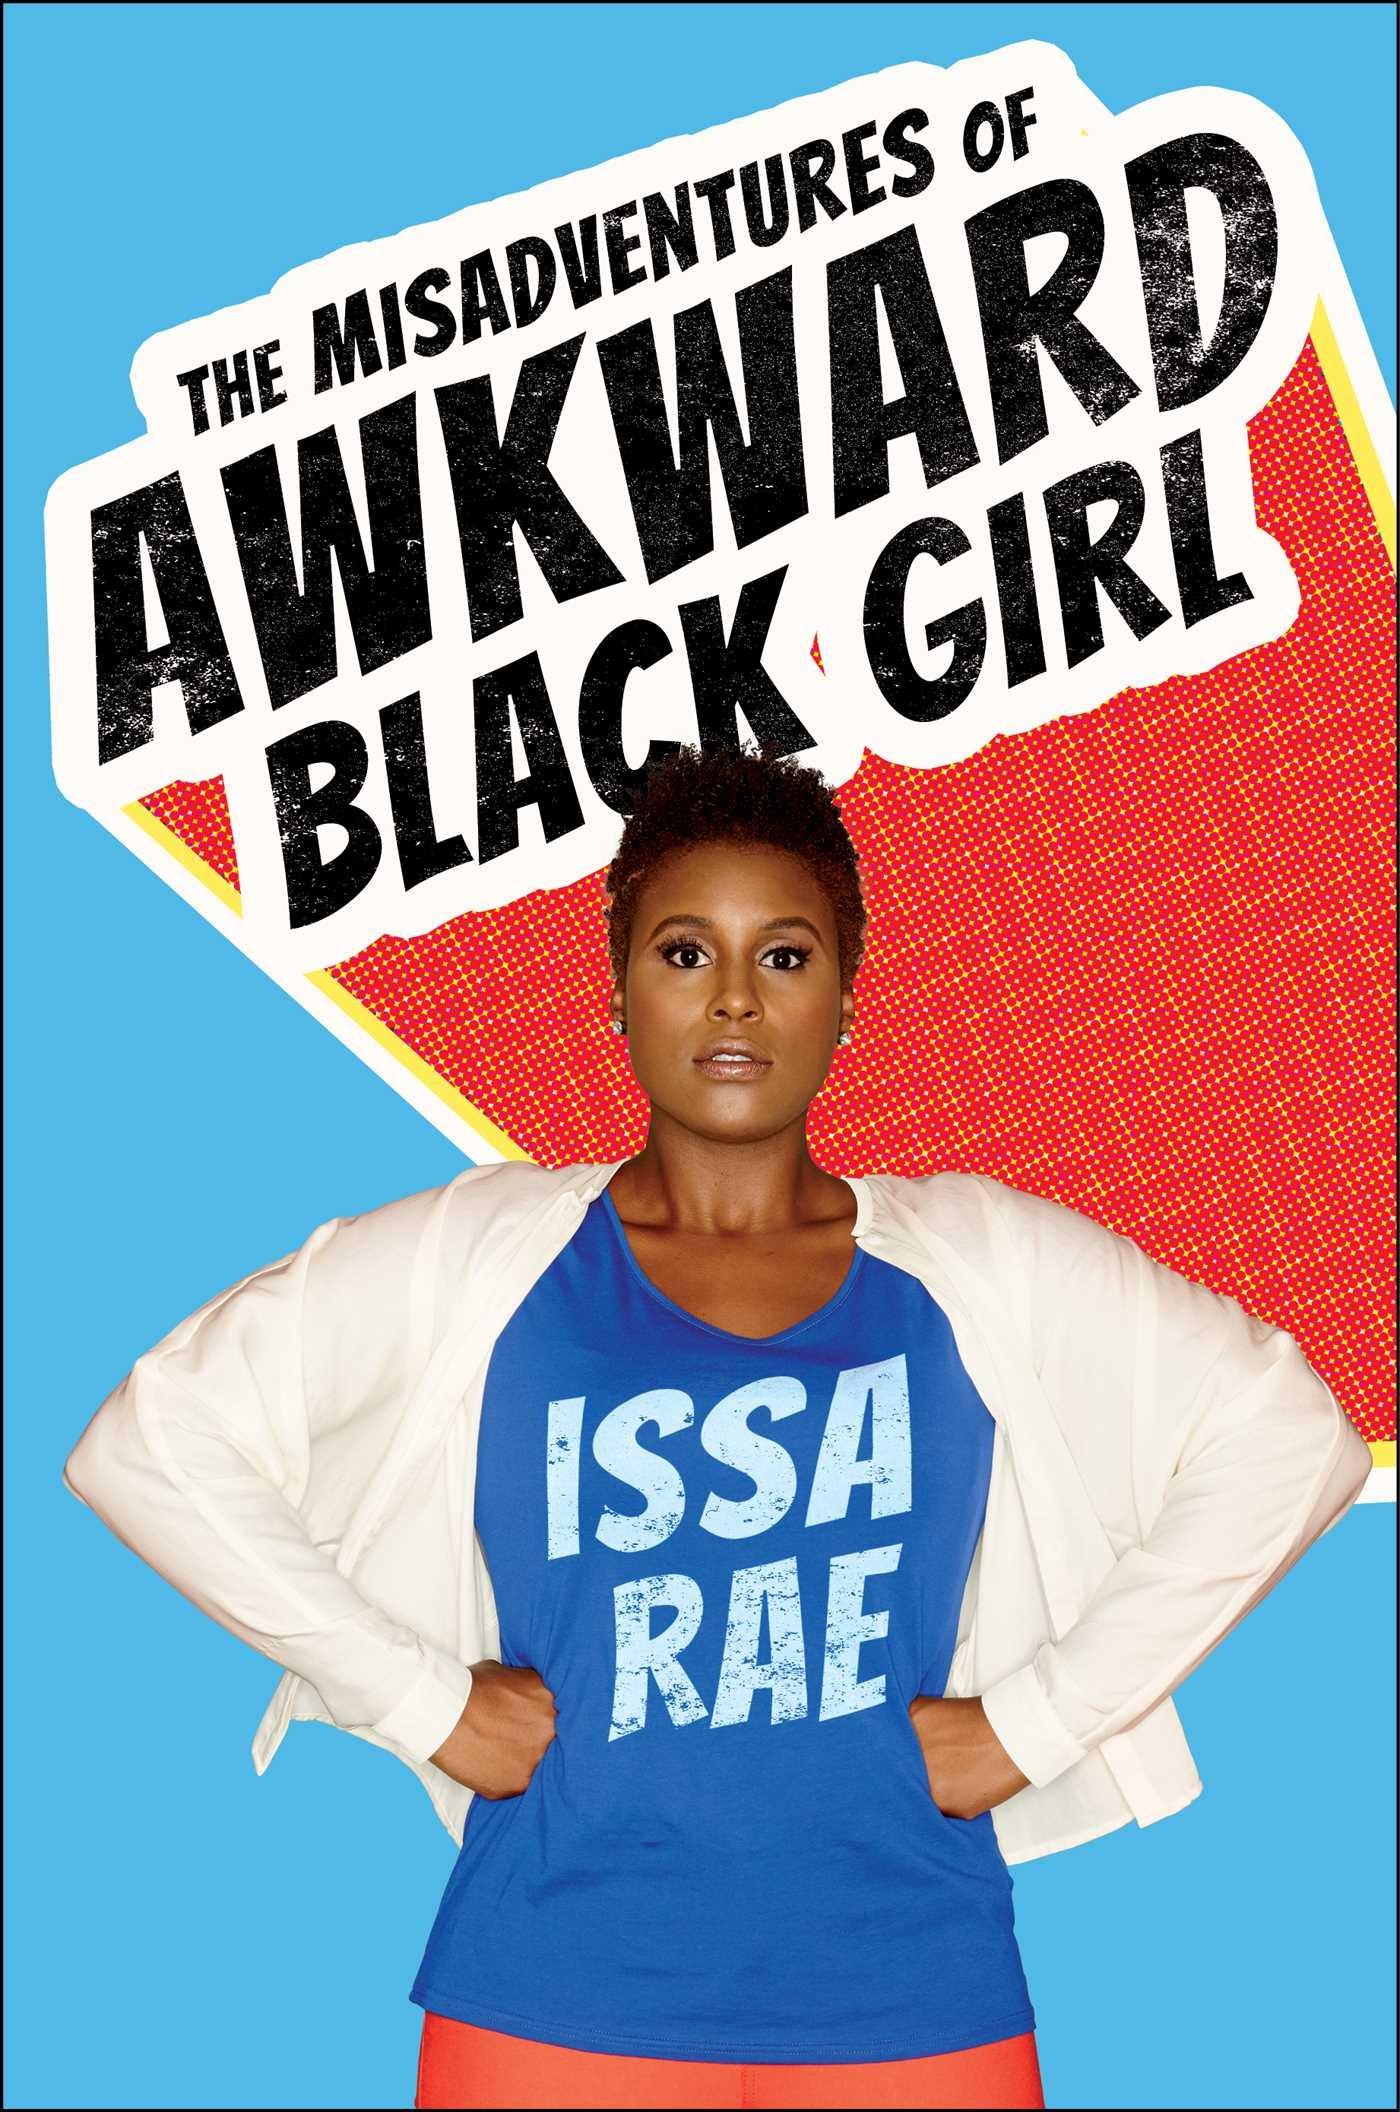 The Misadventures of The Awkward Black Girl